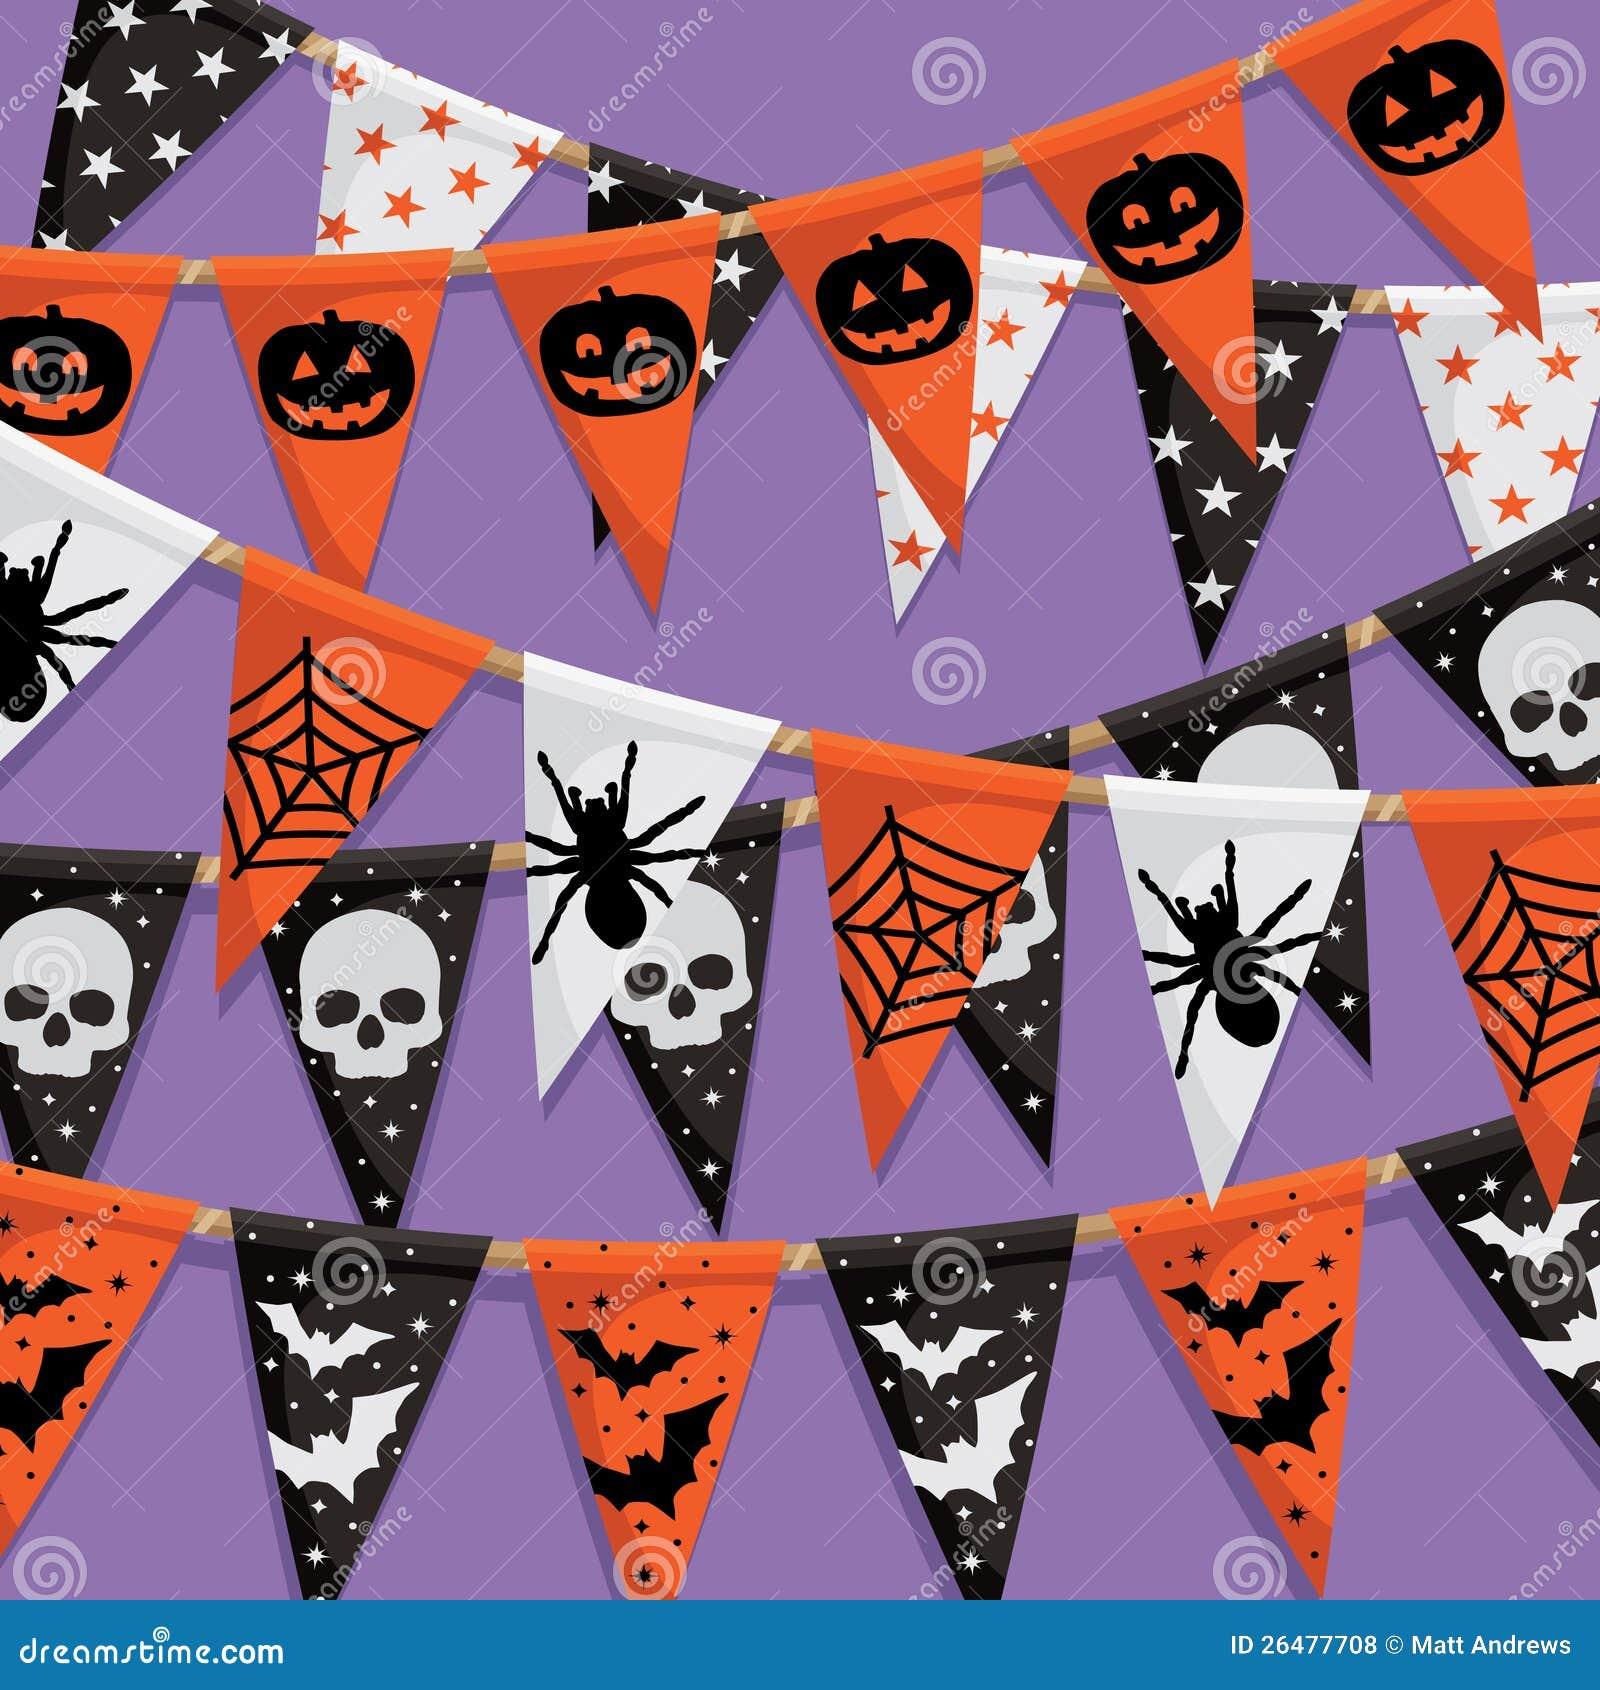 Halloween Bunting halloween bunting Halloween Bunting Background